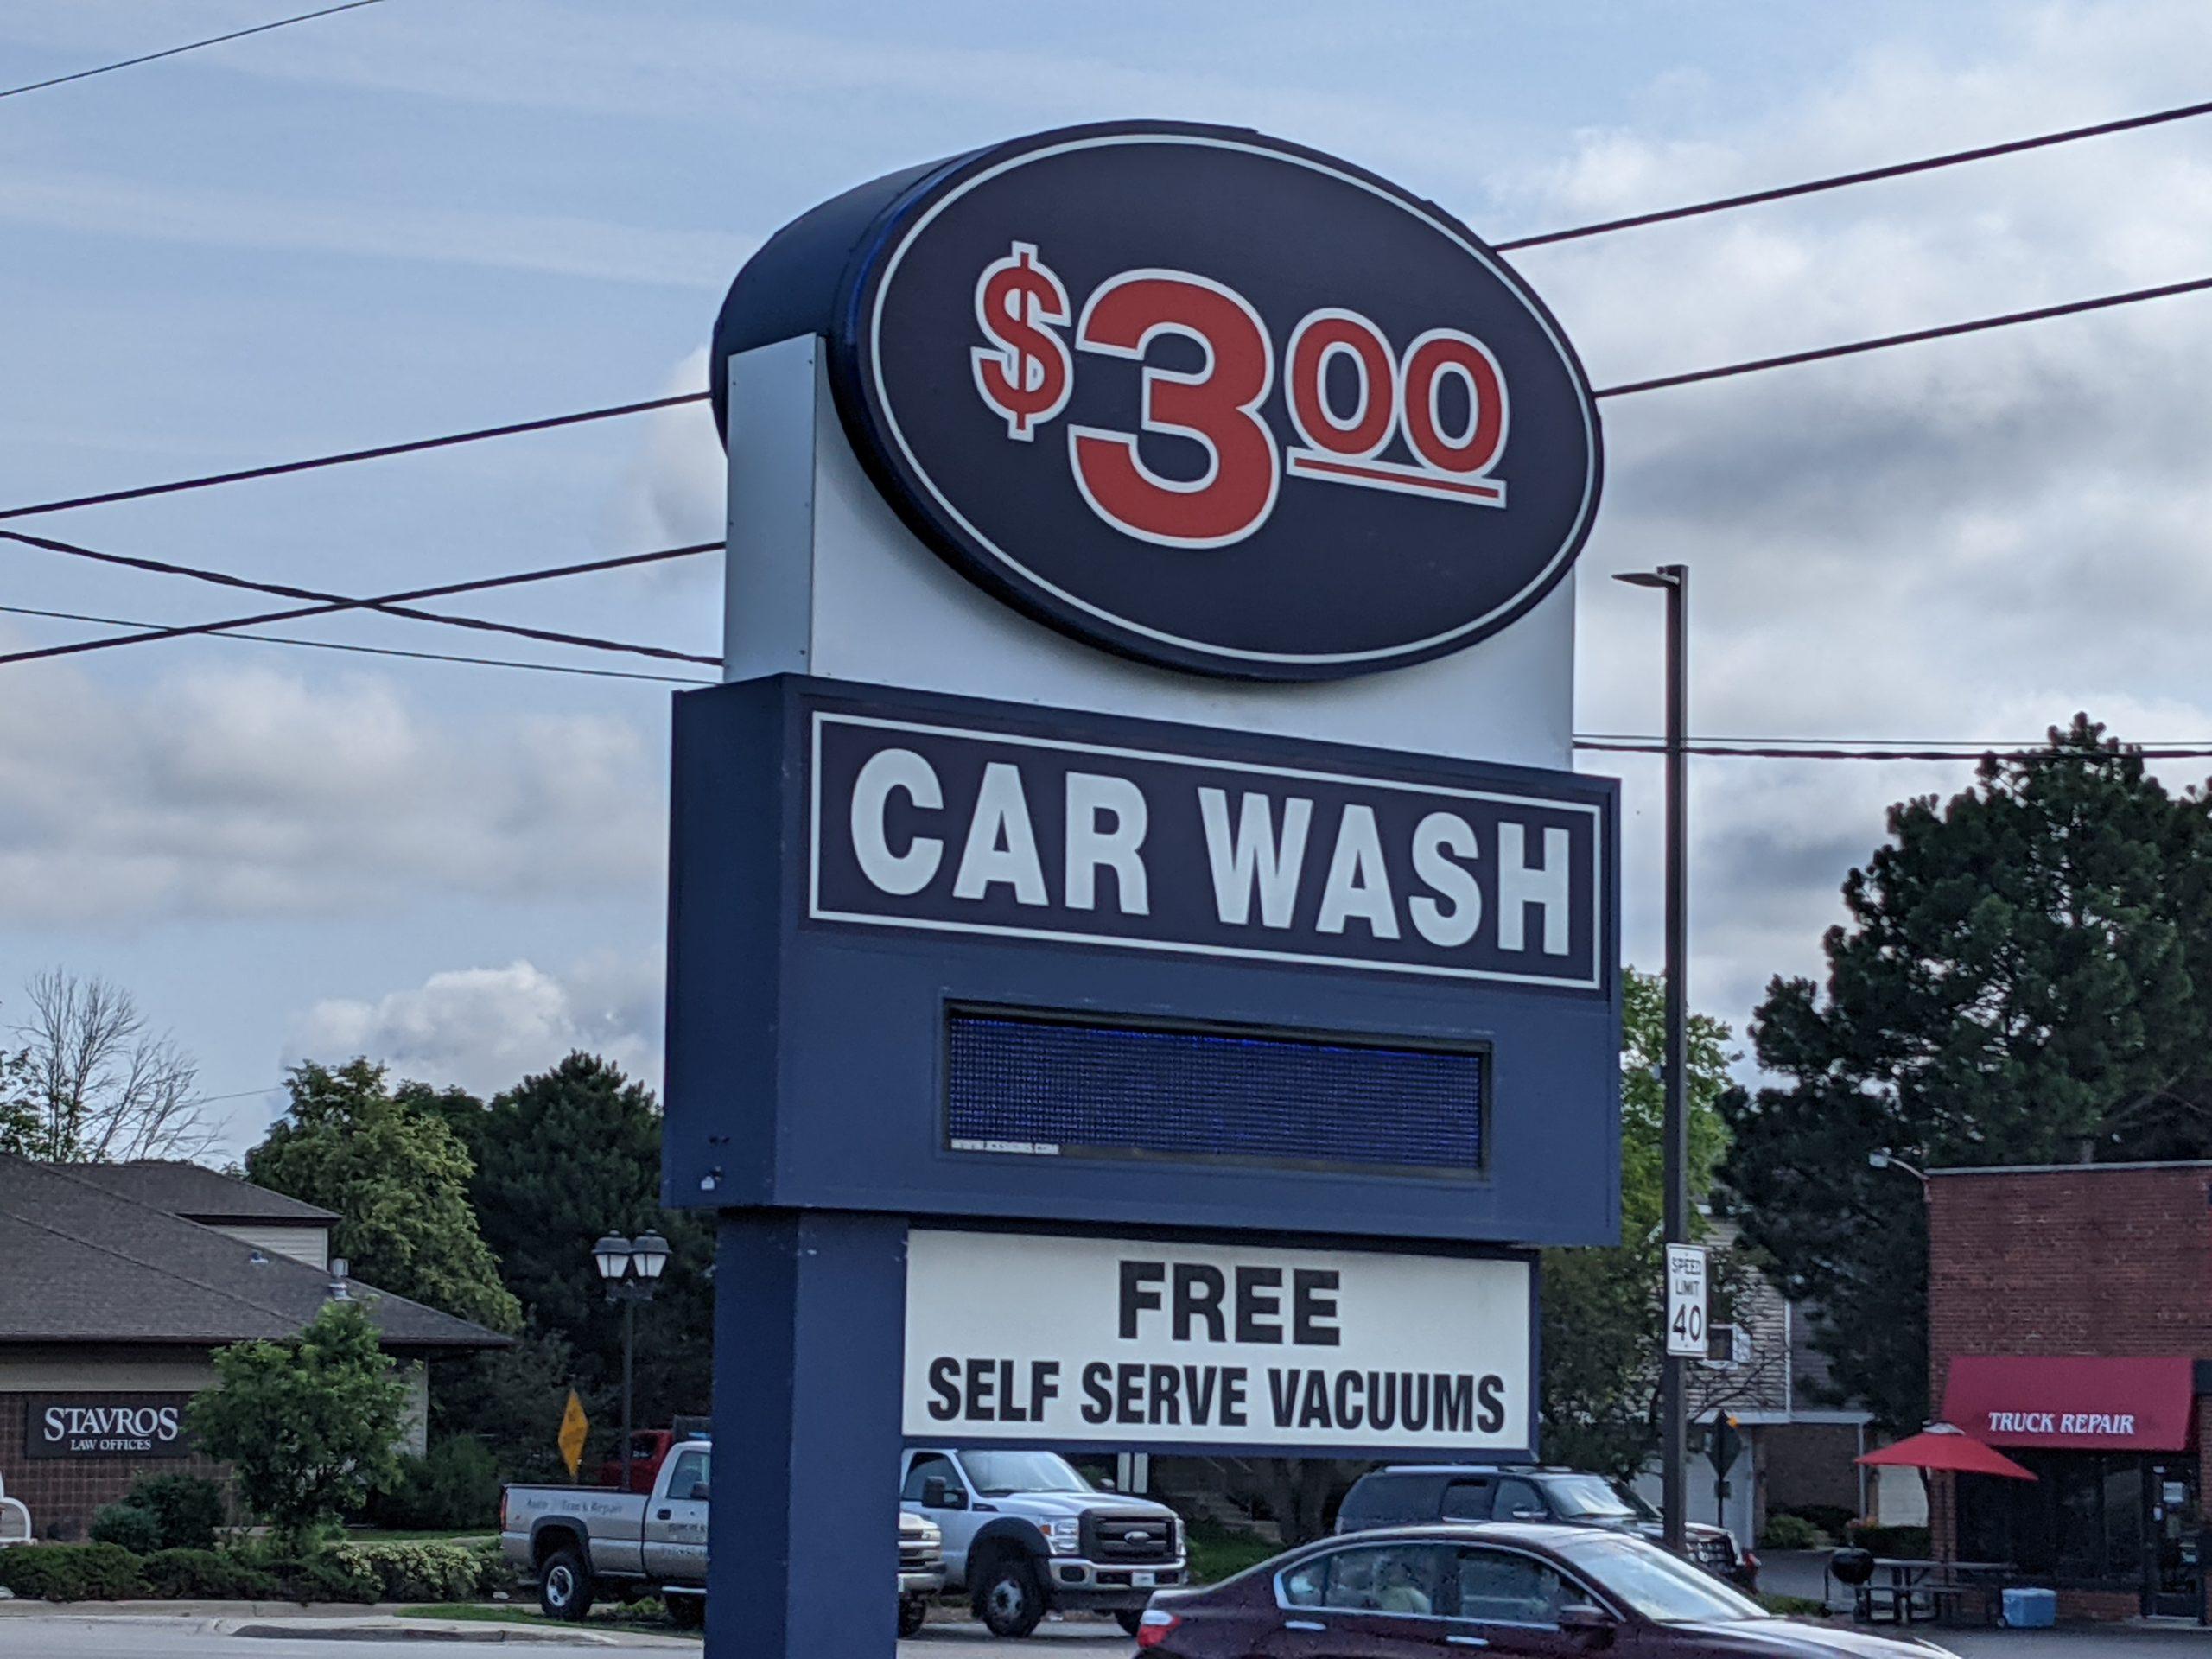 The Original $3.00 Car Wash